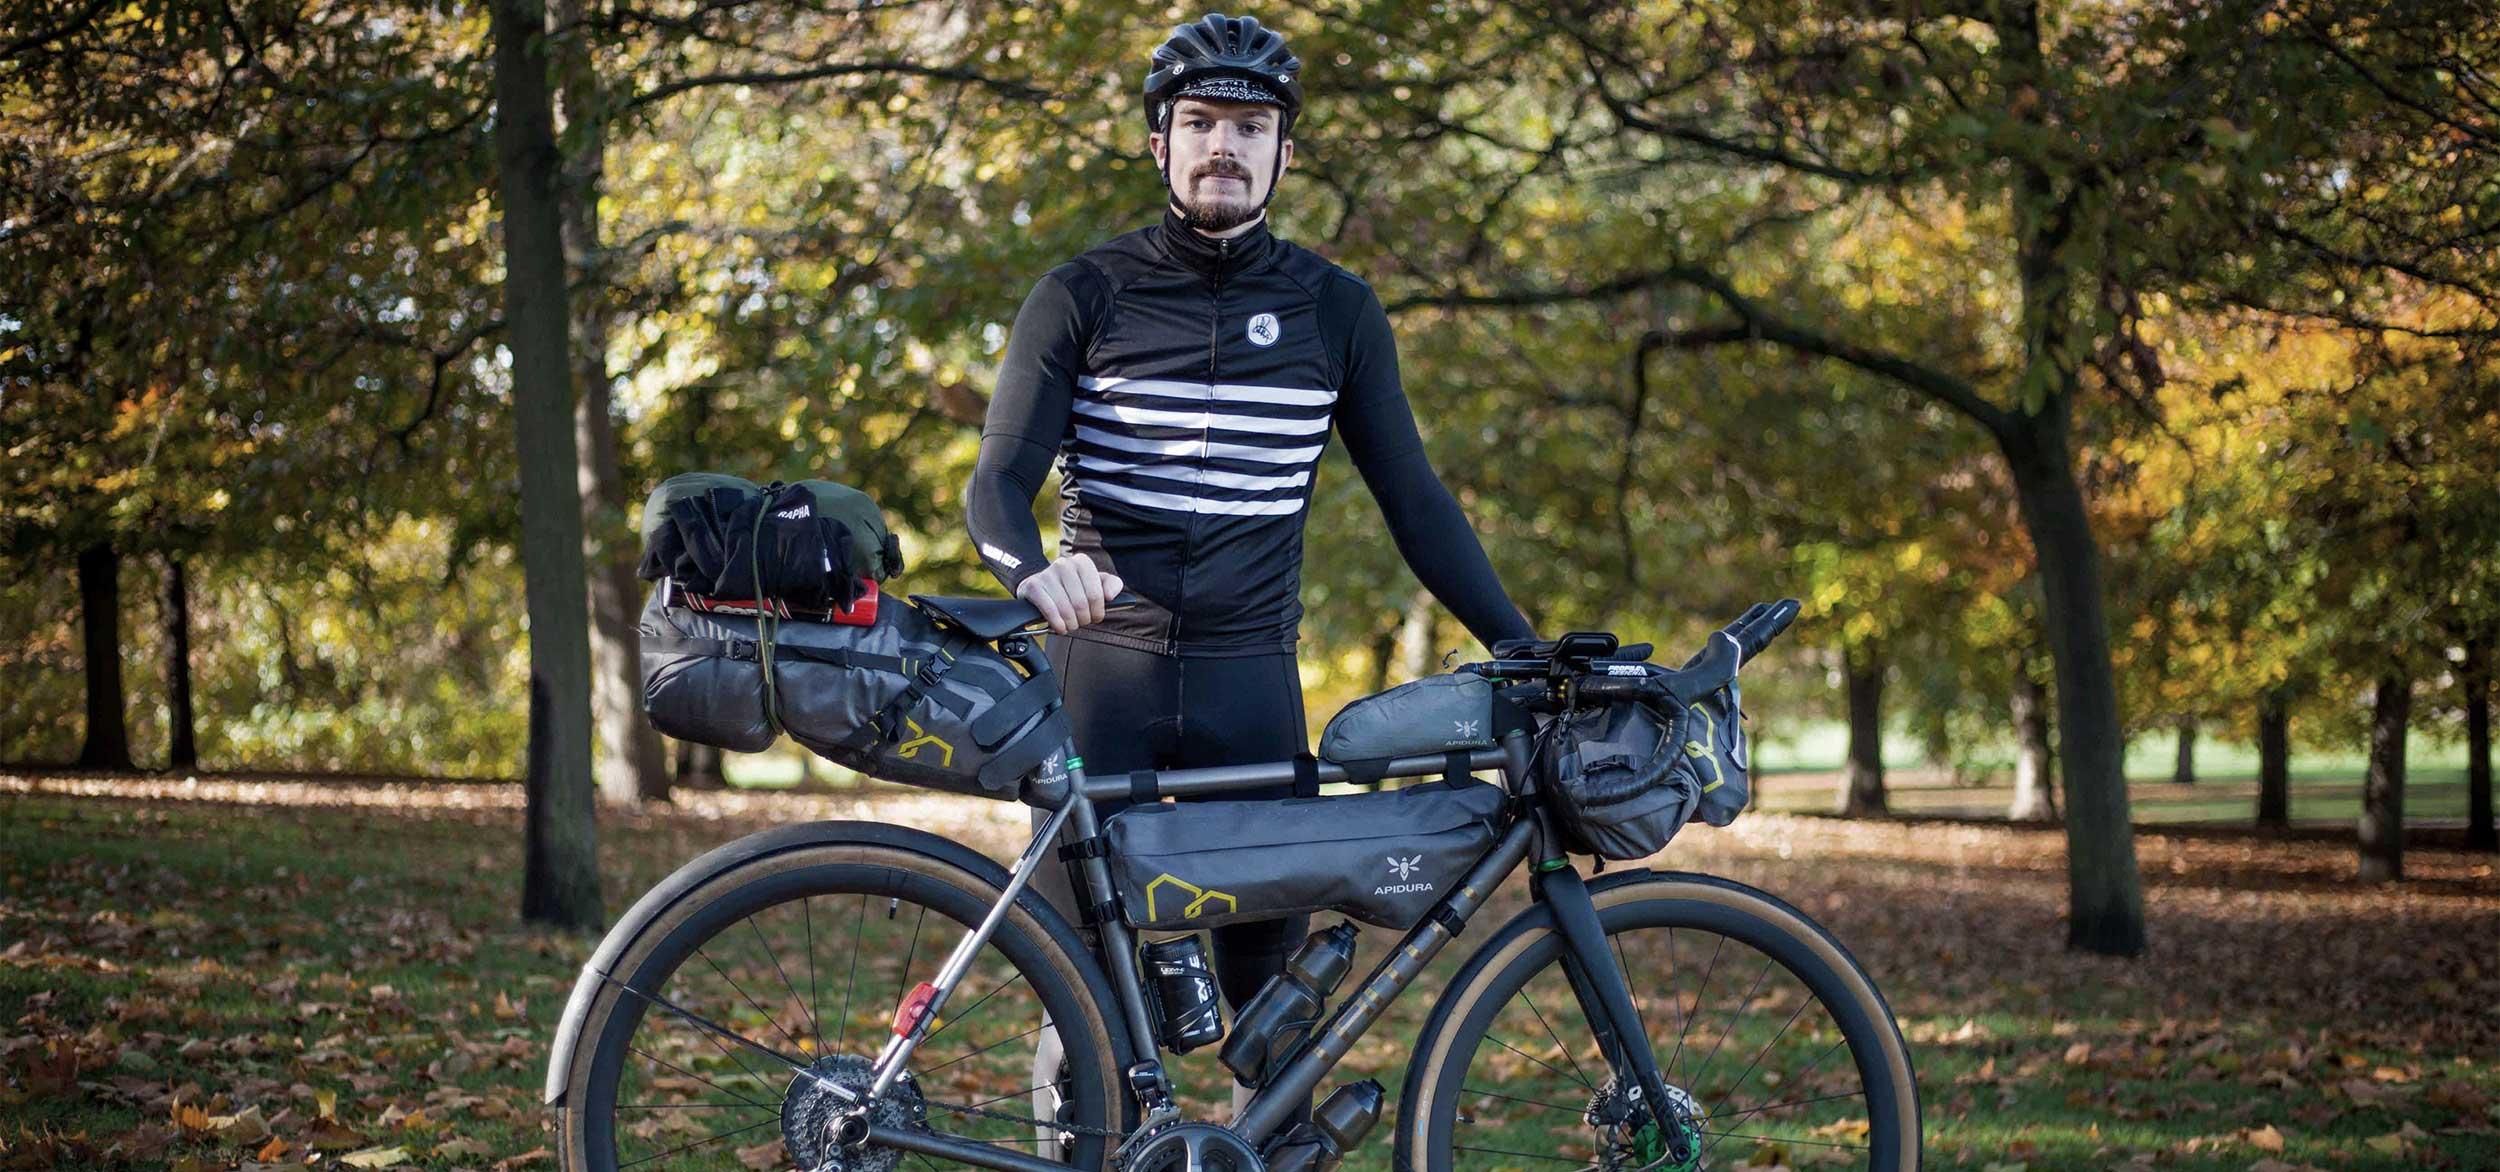 presentation of andrew mathias with his bike apidura packs